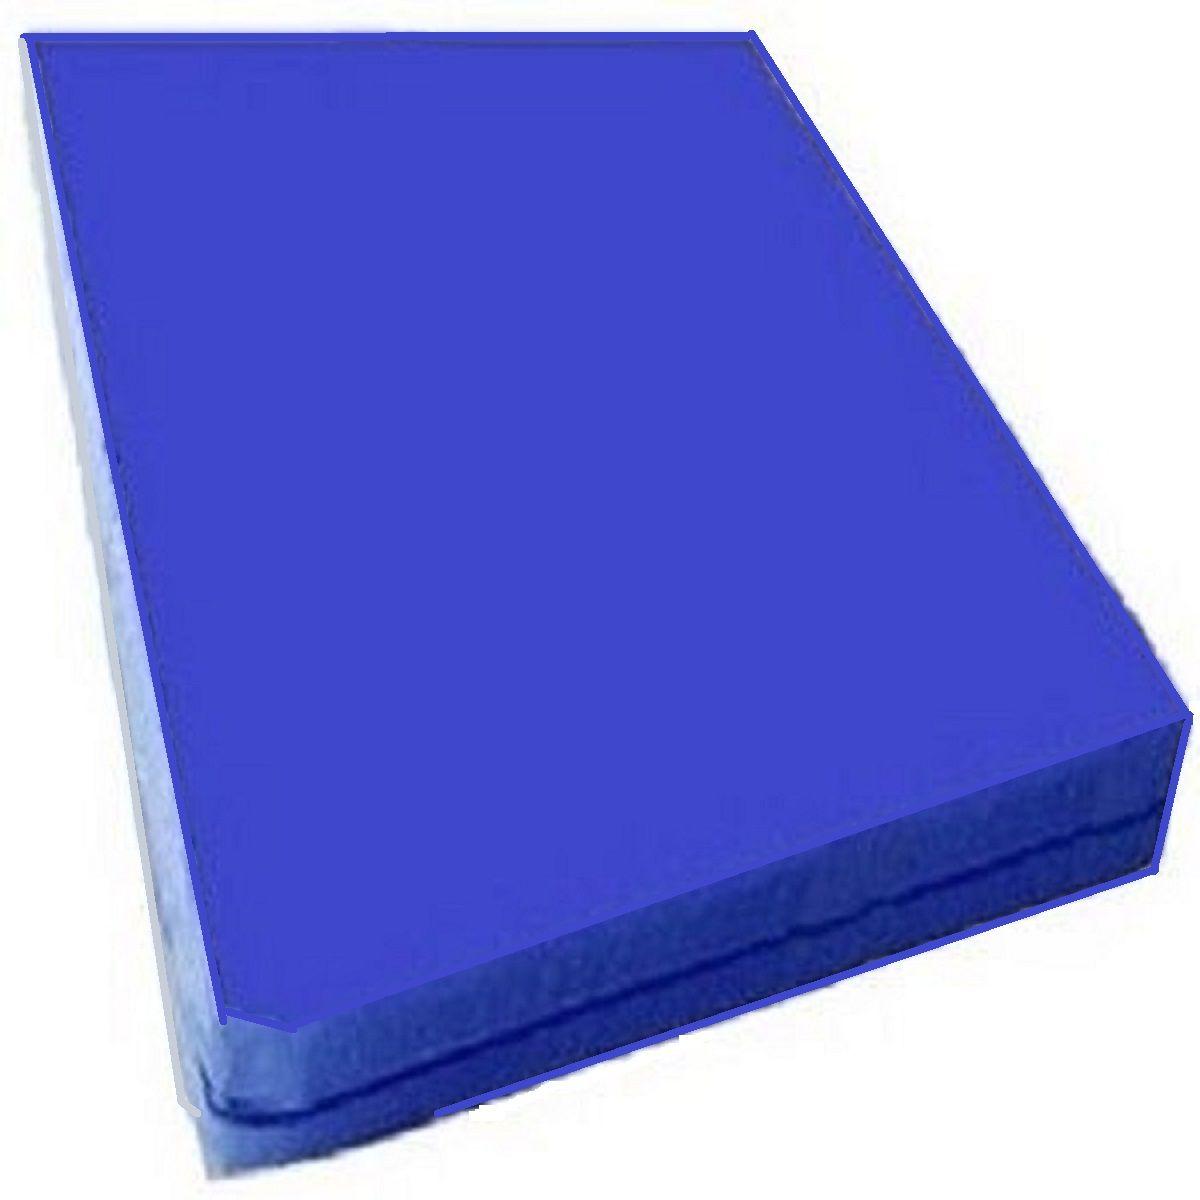 Capa Casal Impermeável Azul Royal Anti alérgica Hospitalar Forrada Com Zíper Proteger capa colchão protetor